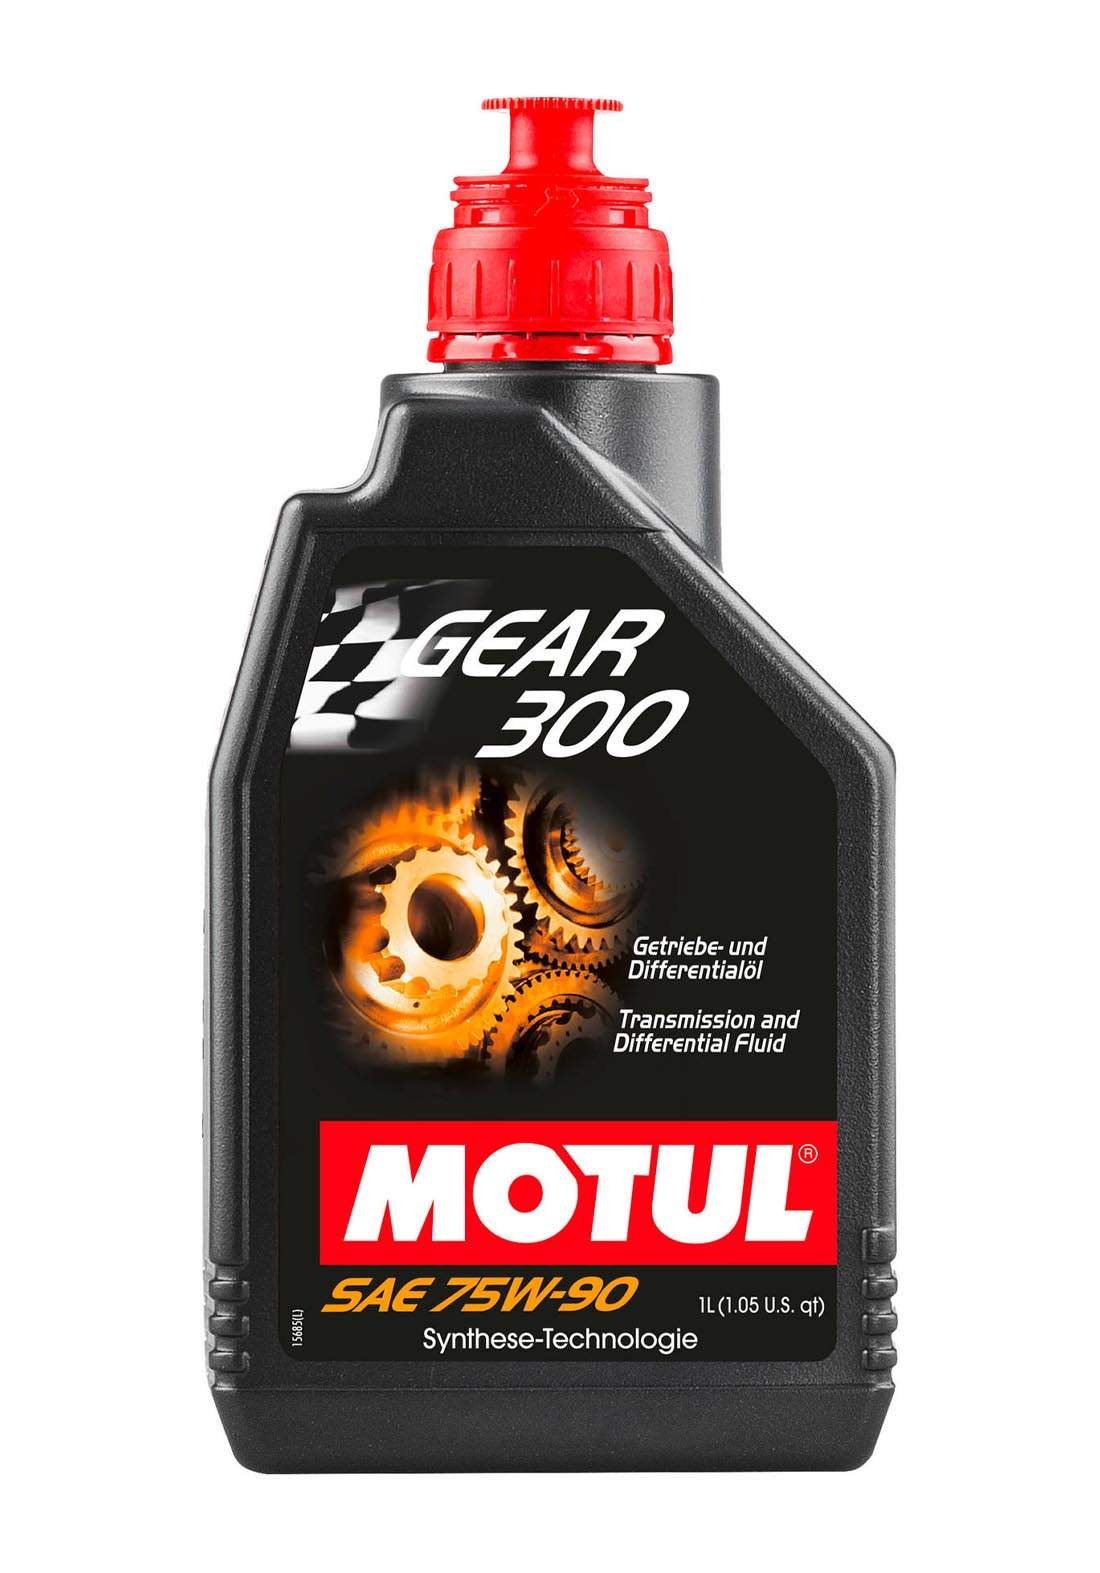 Motul Gear 300LS 75w90 Gear oil 1 L زيت ناقل الحركة اليدوي